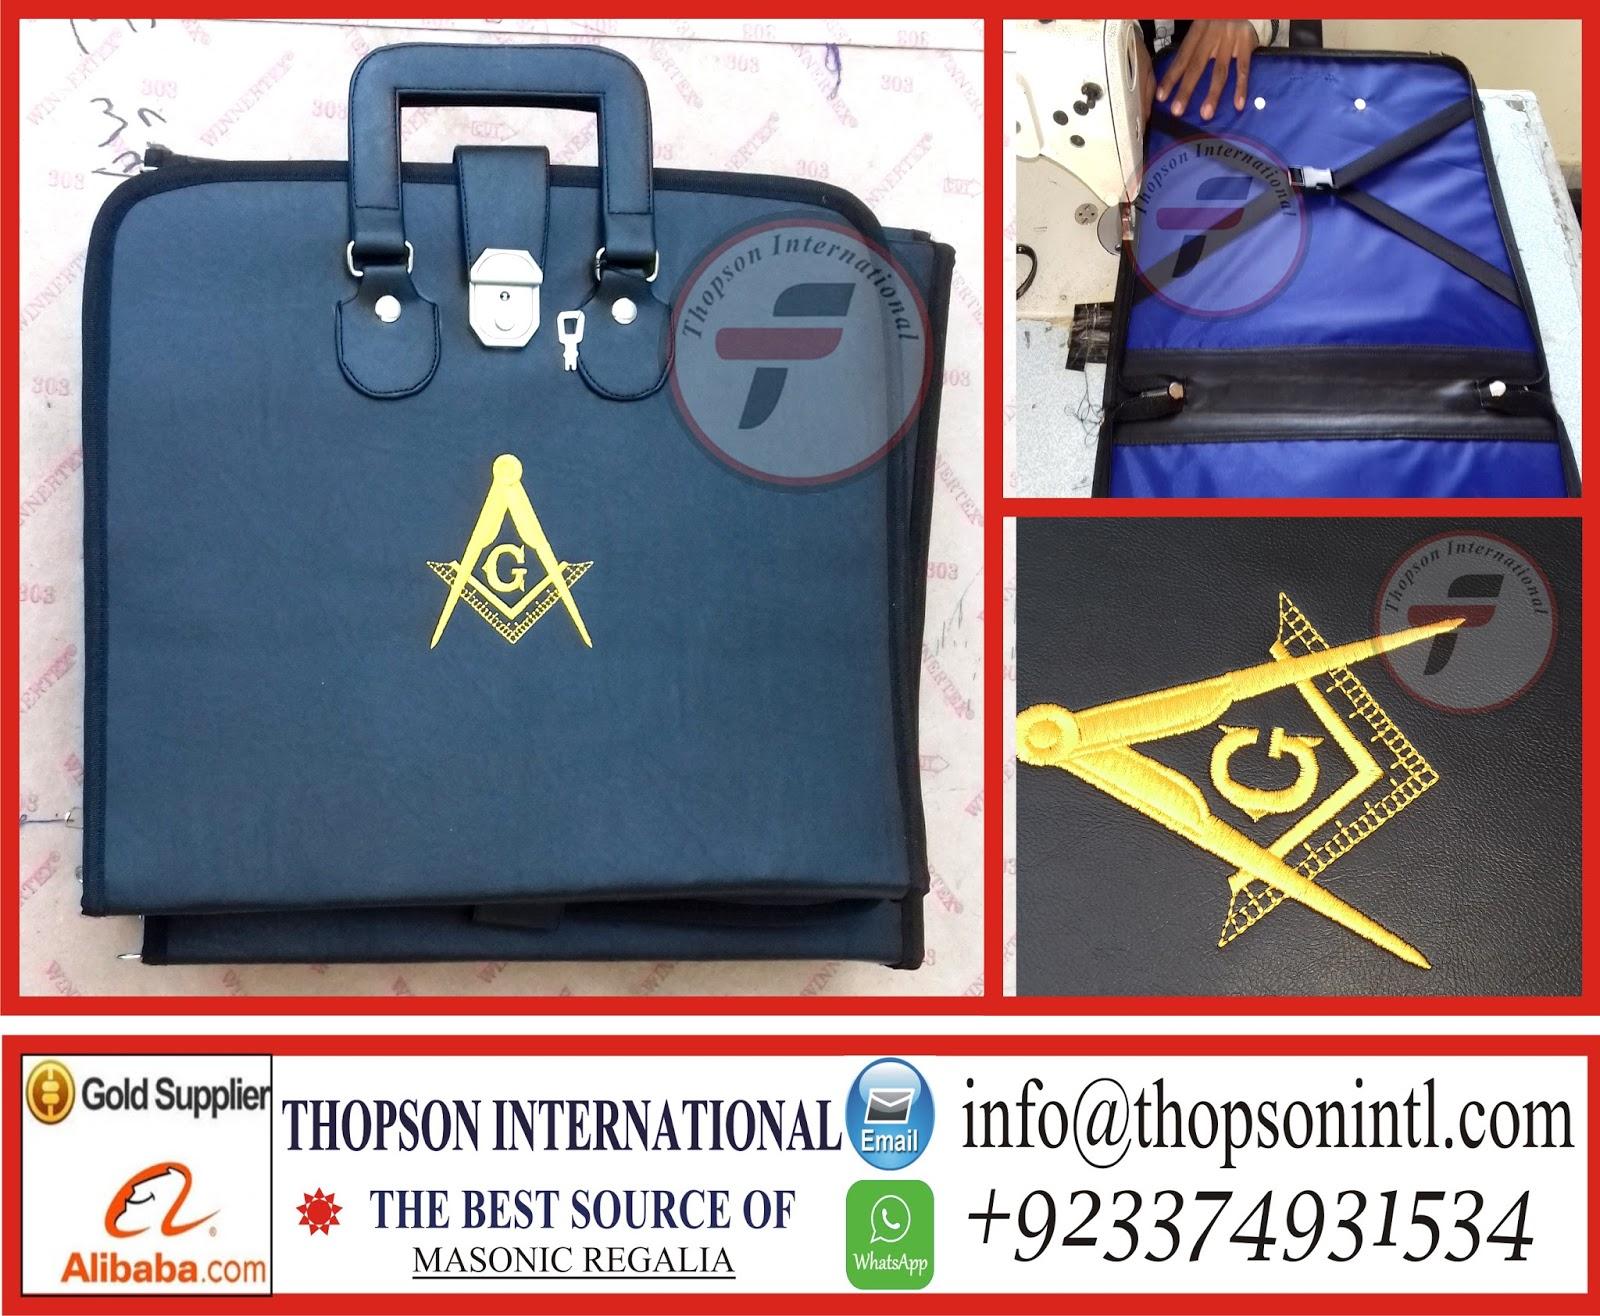 White apron freemason - Masonic Cases With Square Compass